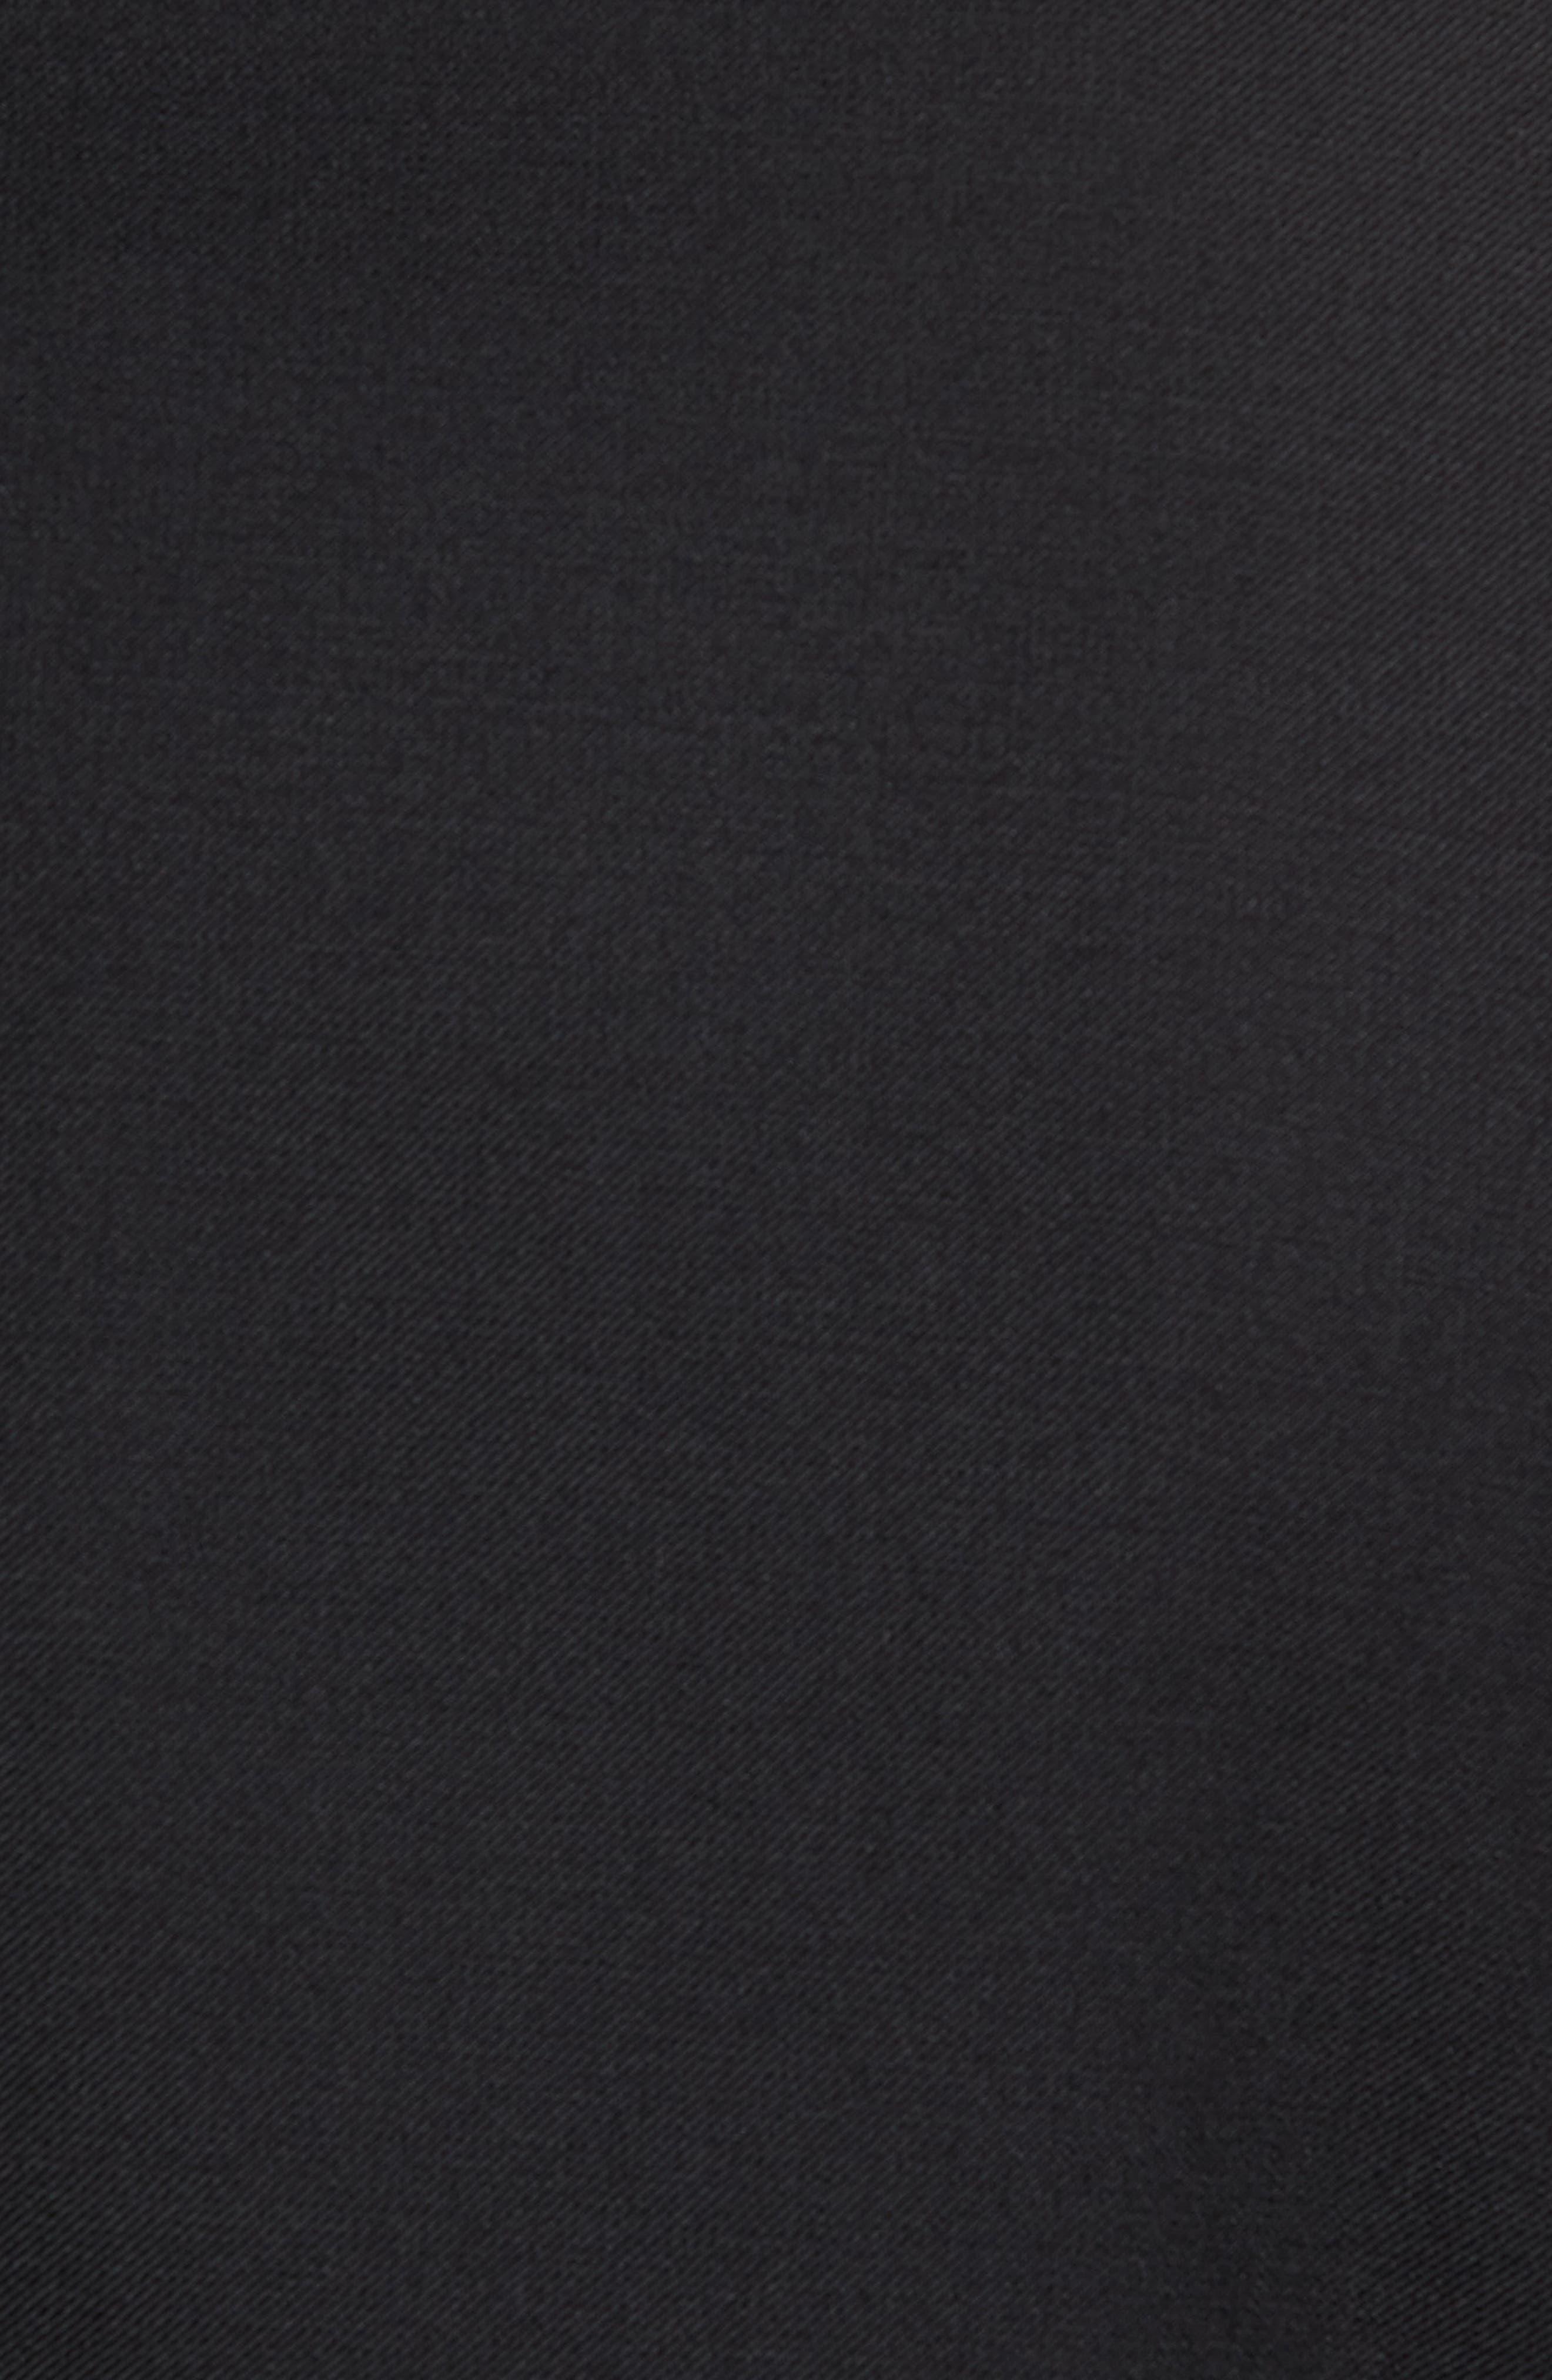 Trim Fit Wool Blend Tuxedo,                             Alternate thumbnail 7, color,                             Black